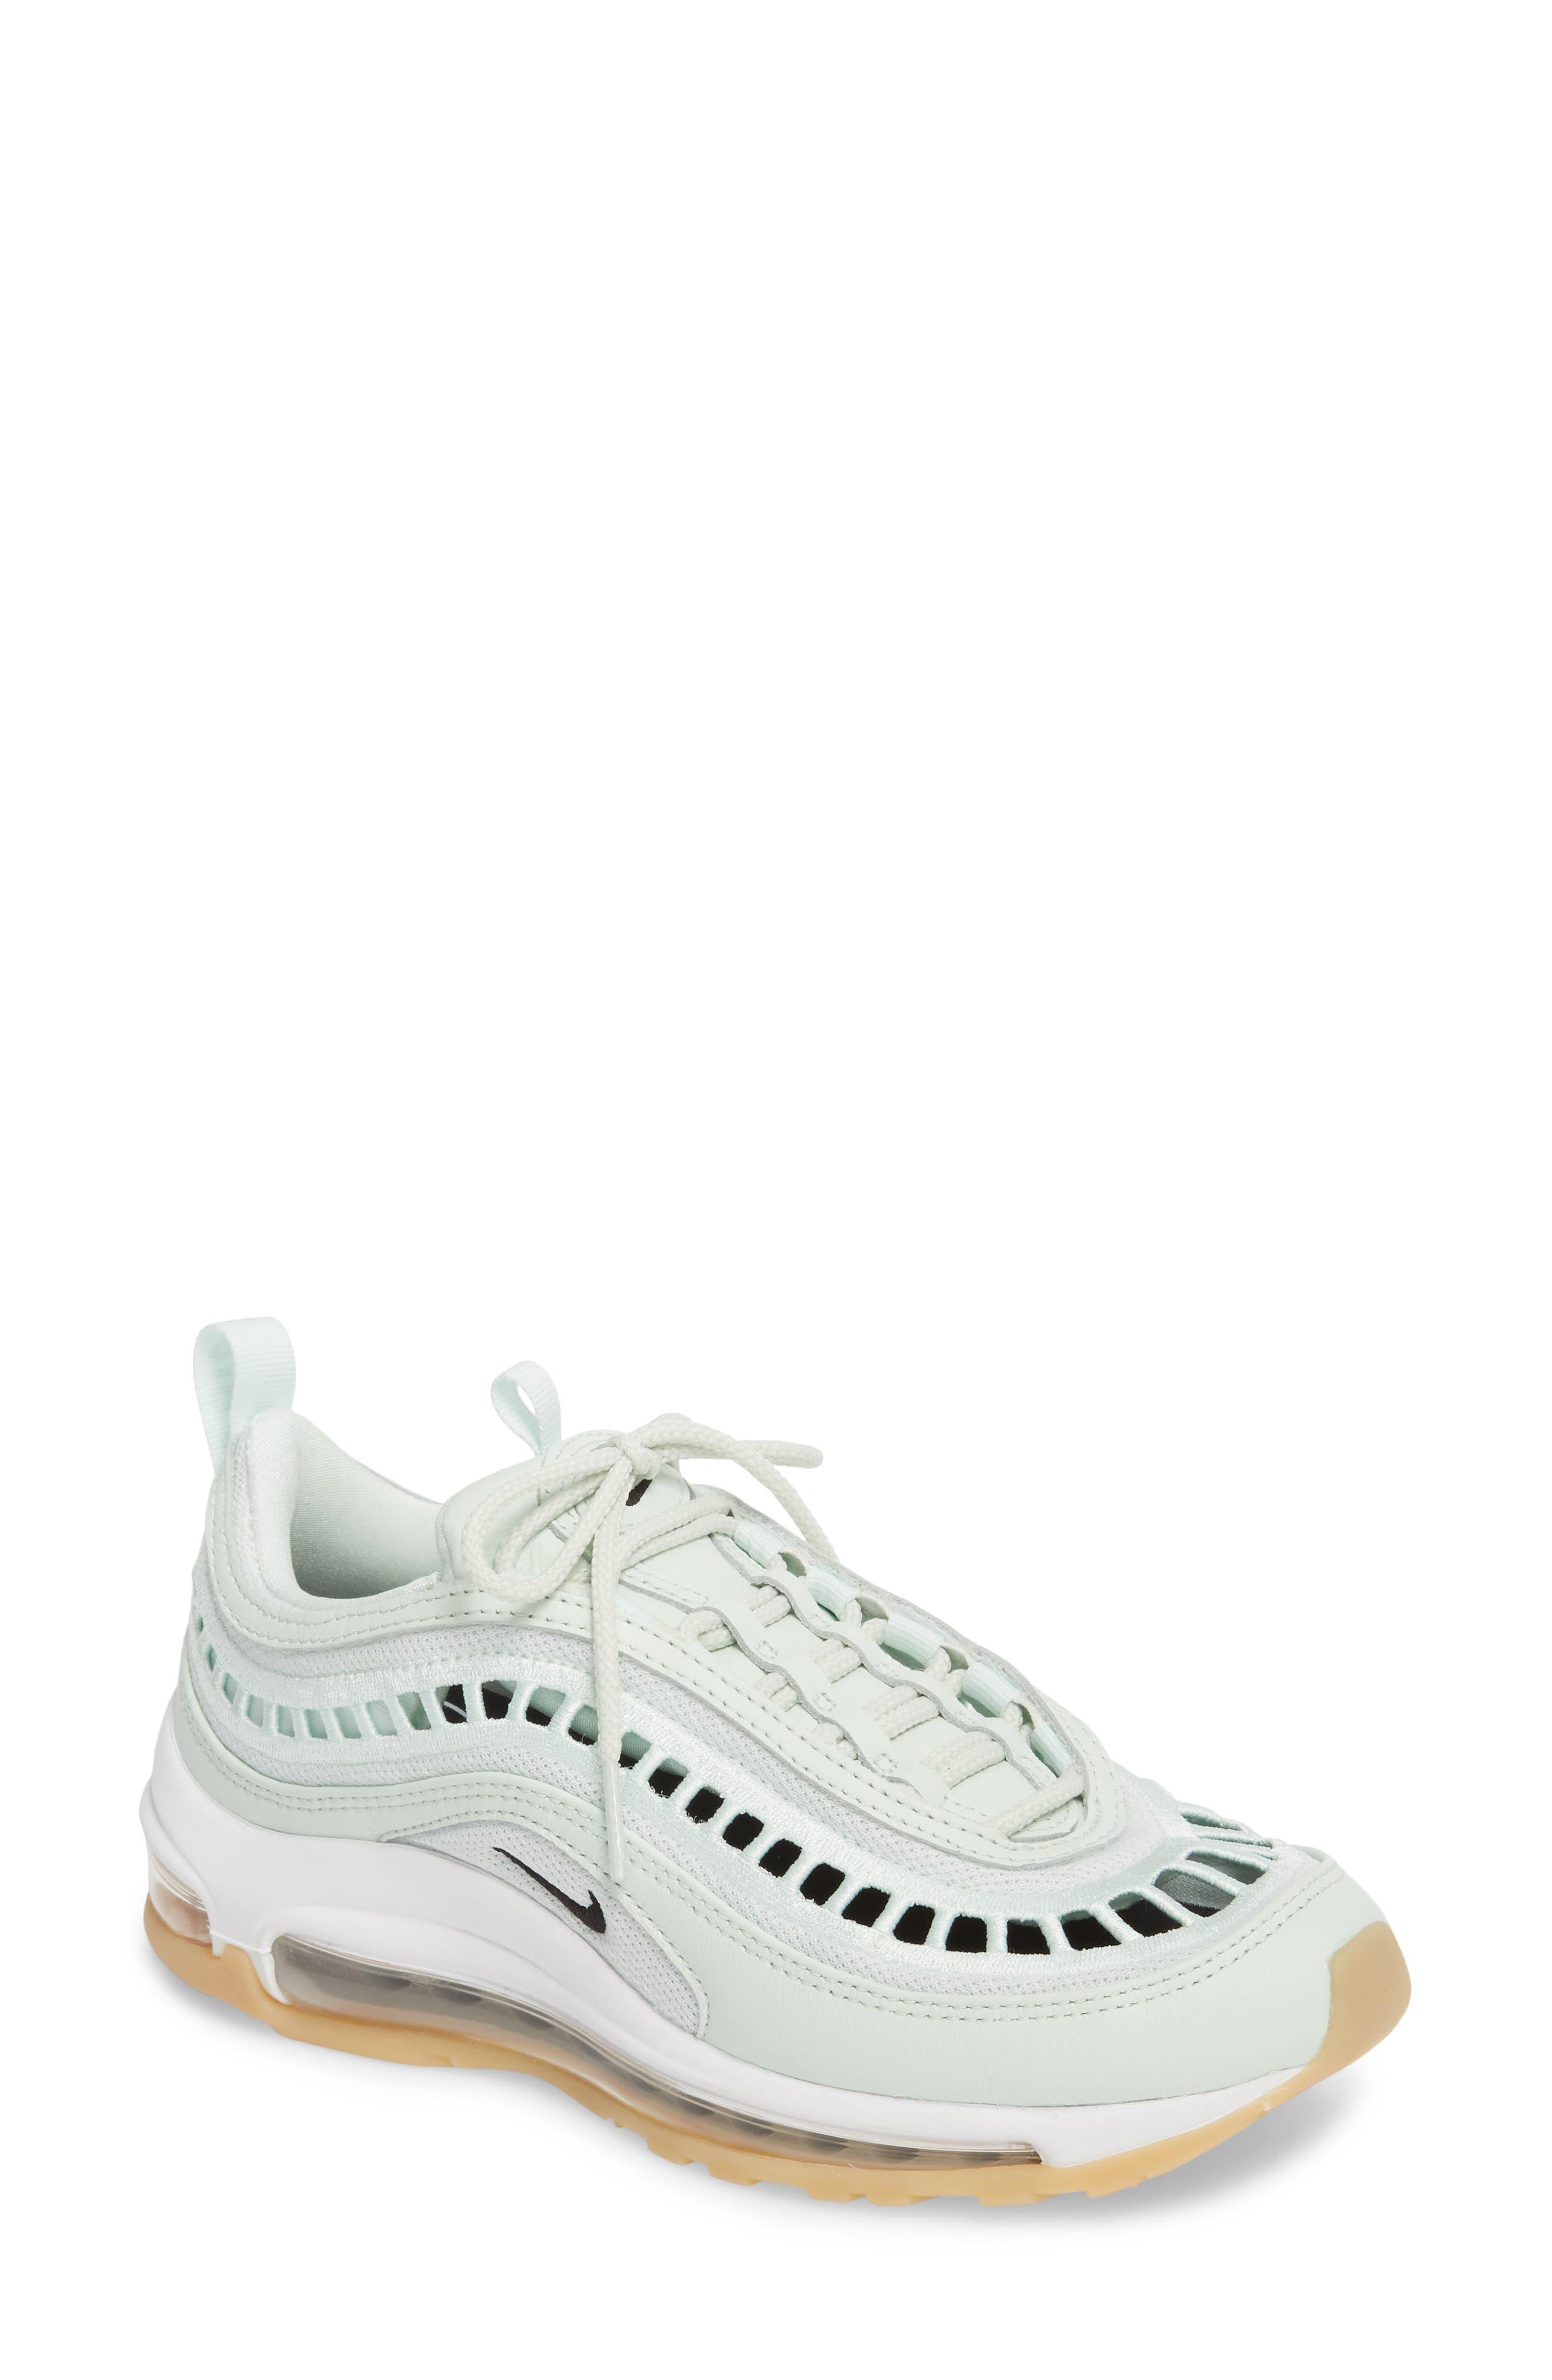 c8d59b1208bd ... new zealand nike air max 97 ultra 17 si sneaker women 7b8c9 5f3c0